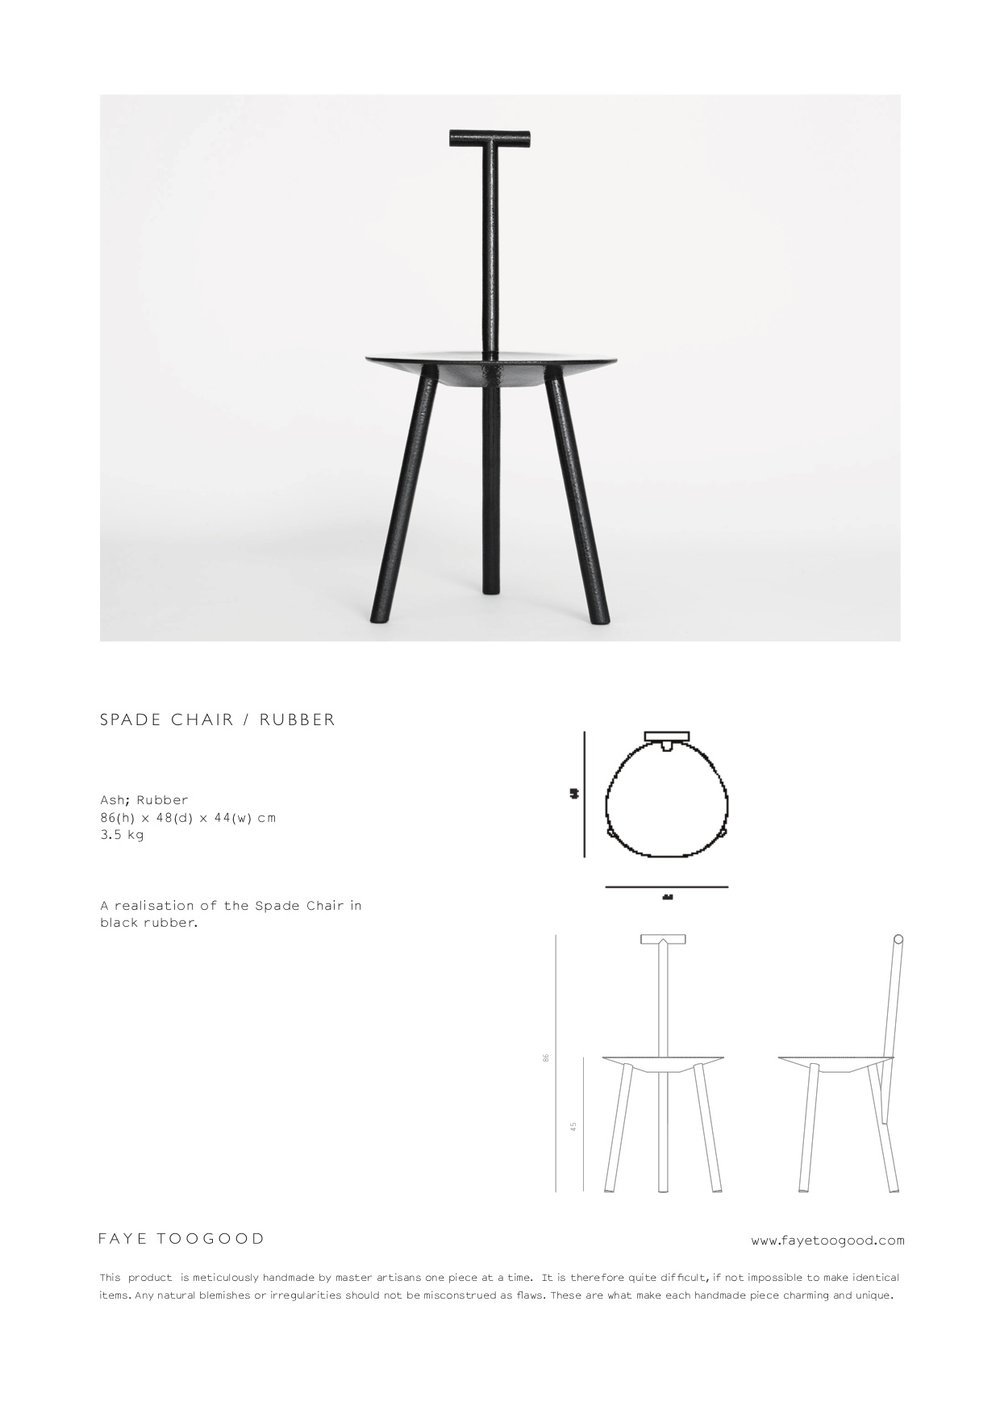 Spade_Chair_Rubber_Specification_Sheet.jpg